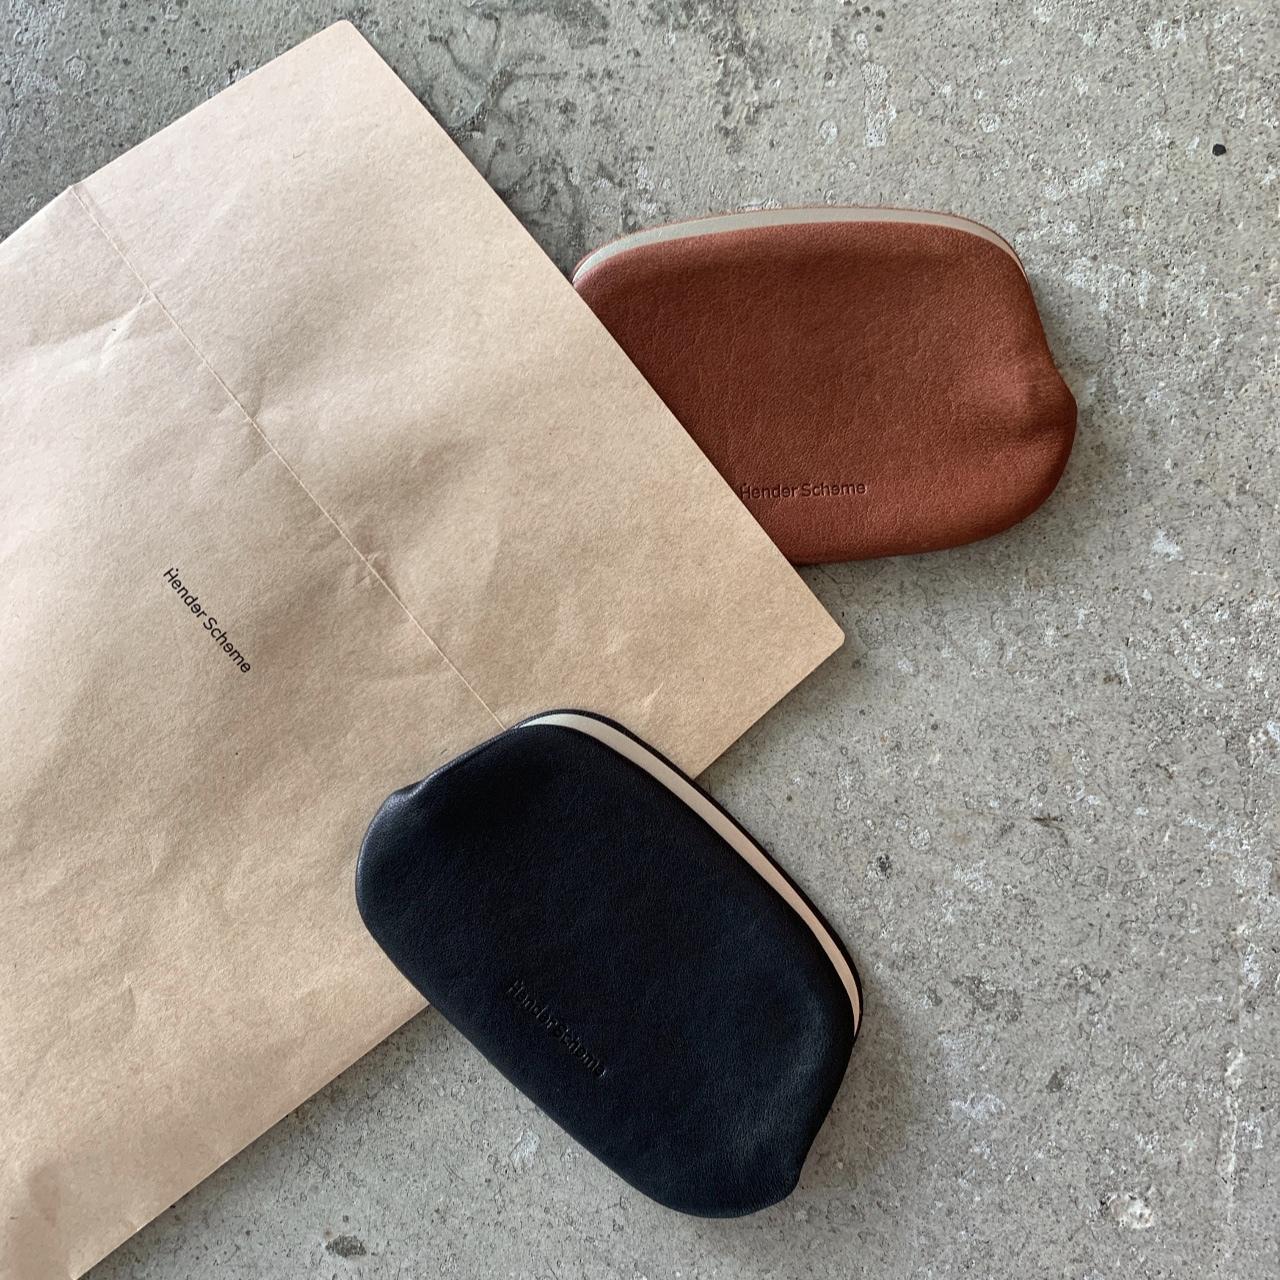 Hender Scheme - snap purse small